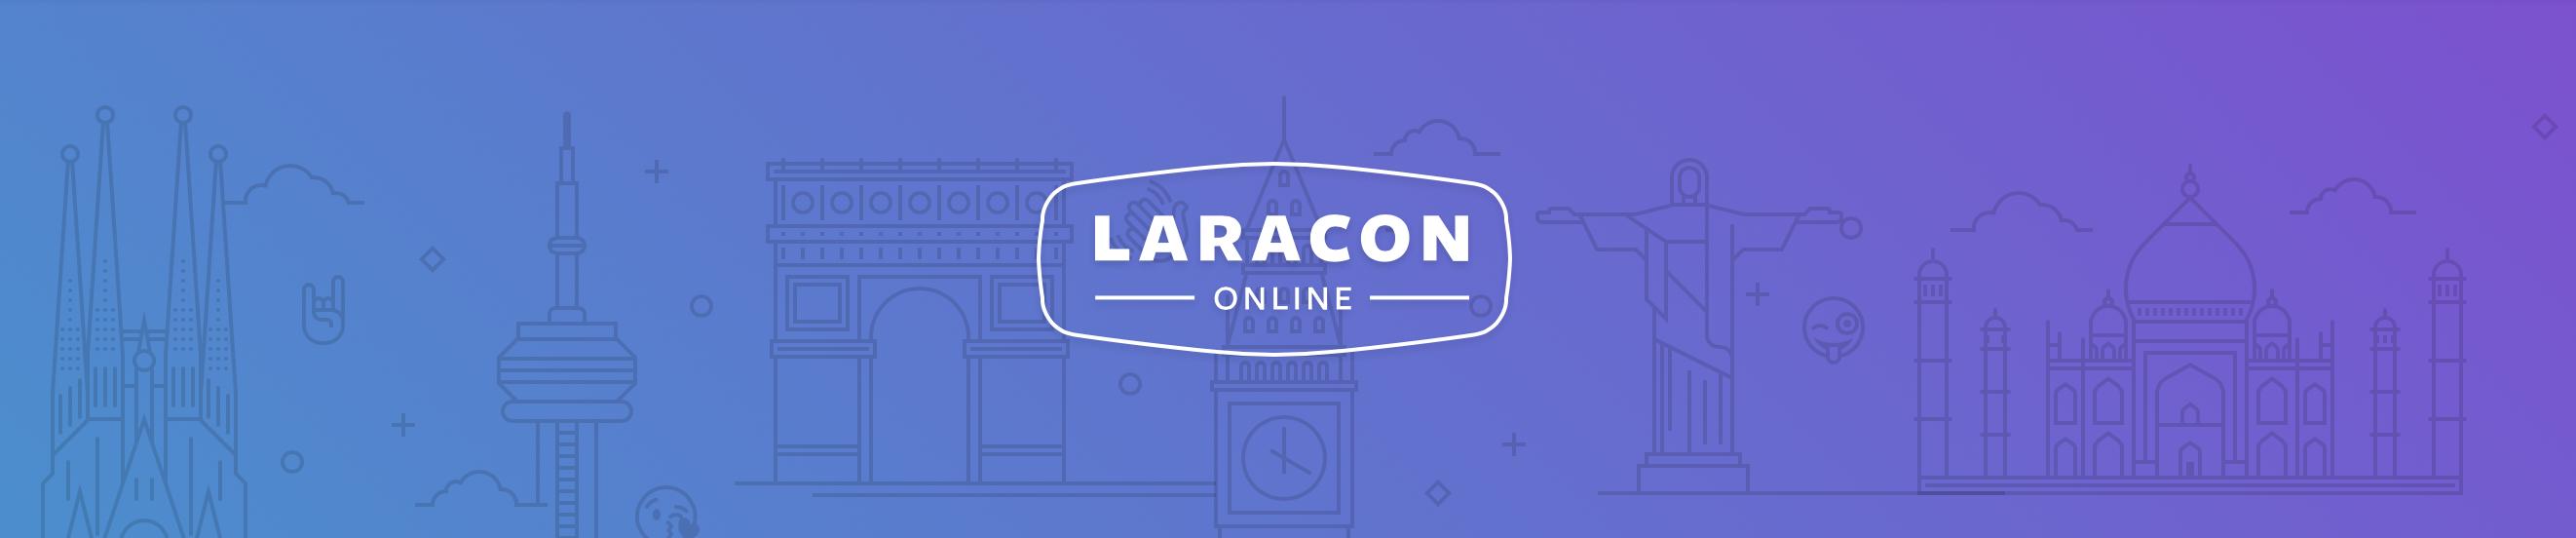 Laracon Online 2018